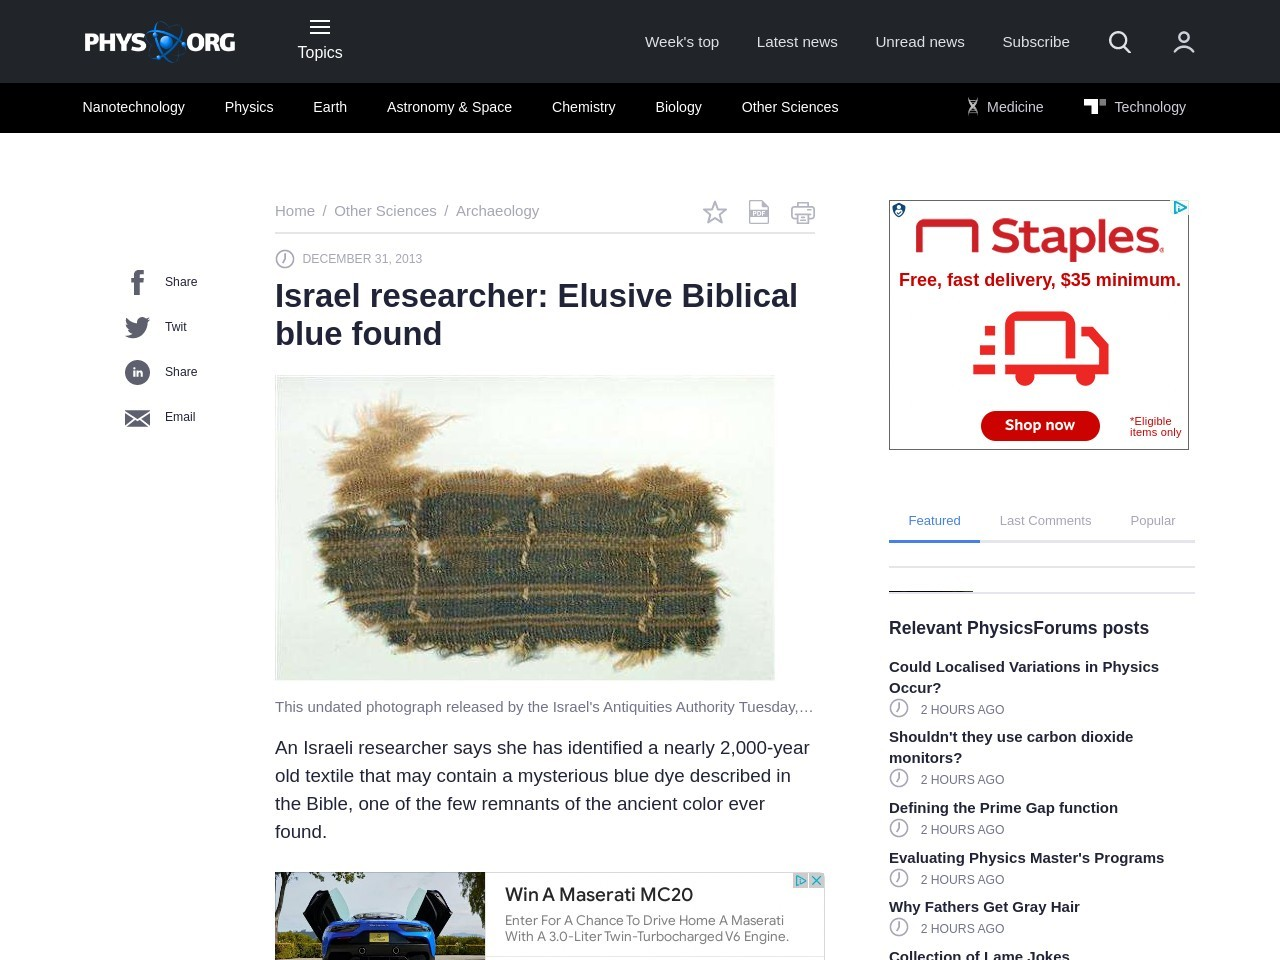 Israel researcher: Elusive Biblical blue found – Phys.org